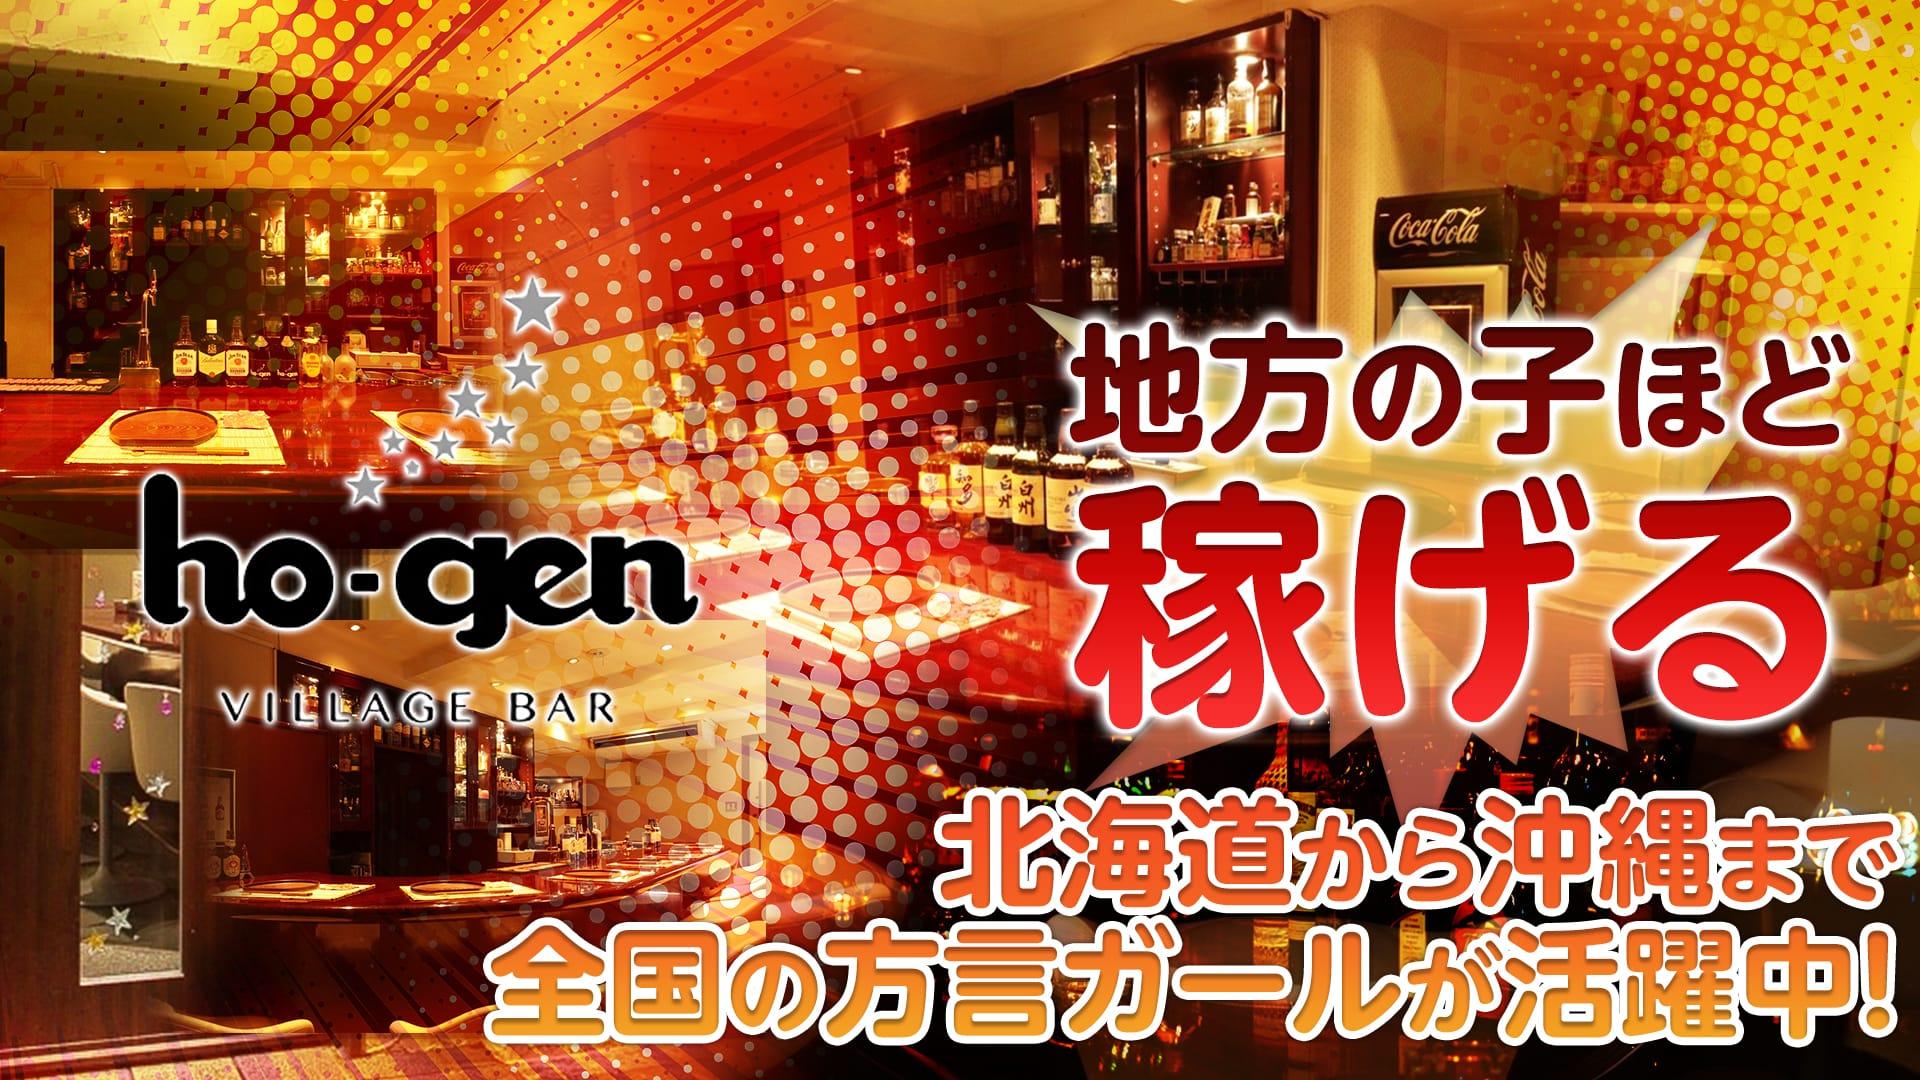 VILLAGE BAR ho-gen<ヴィレッジバーホーゲン> 神田 ガールズバー TOP画像